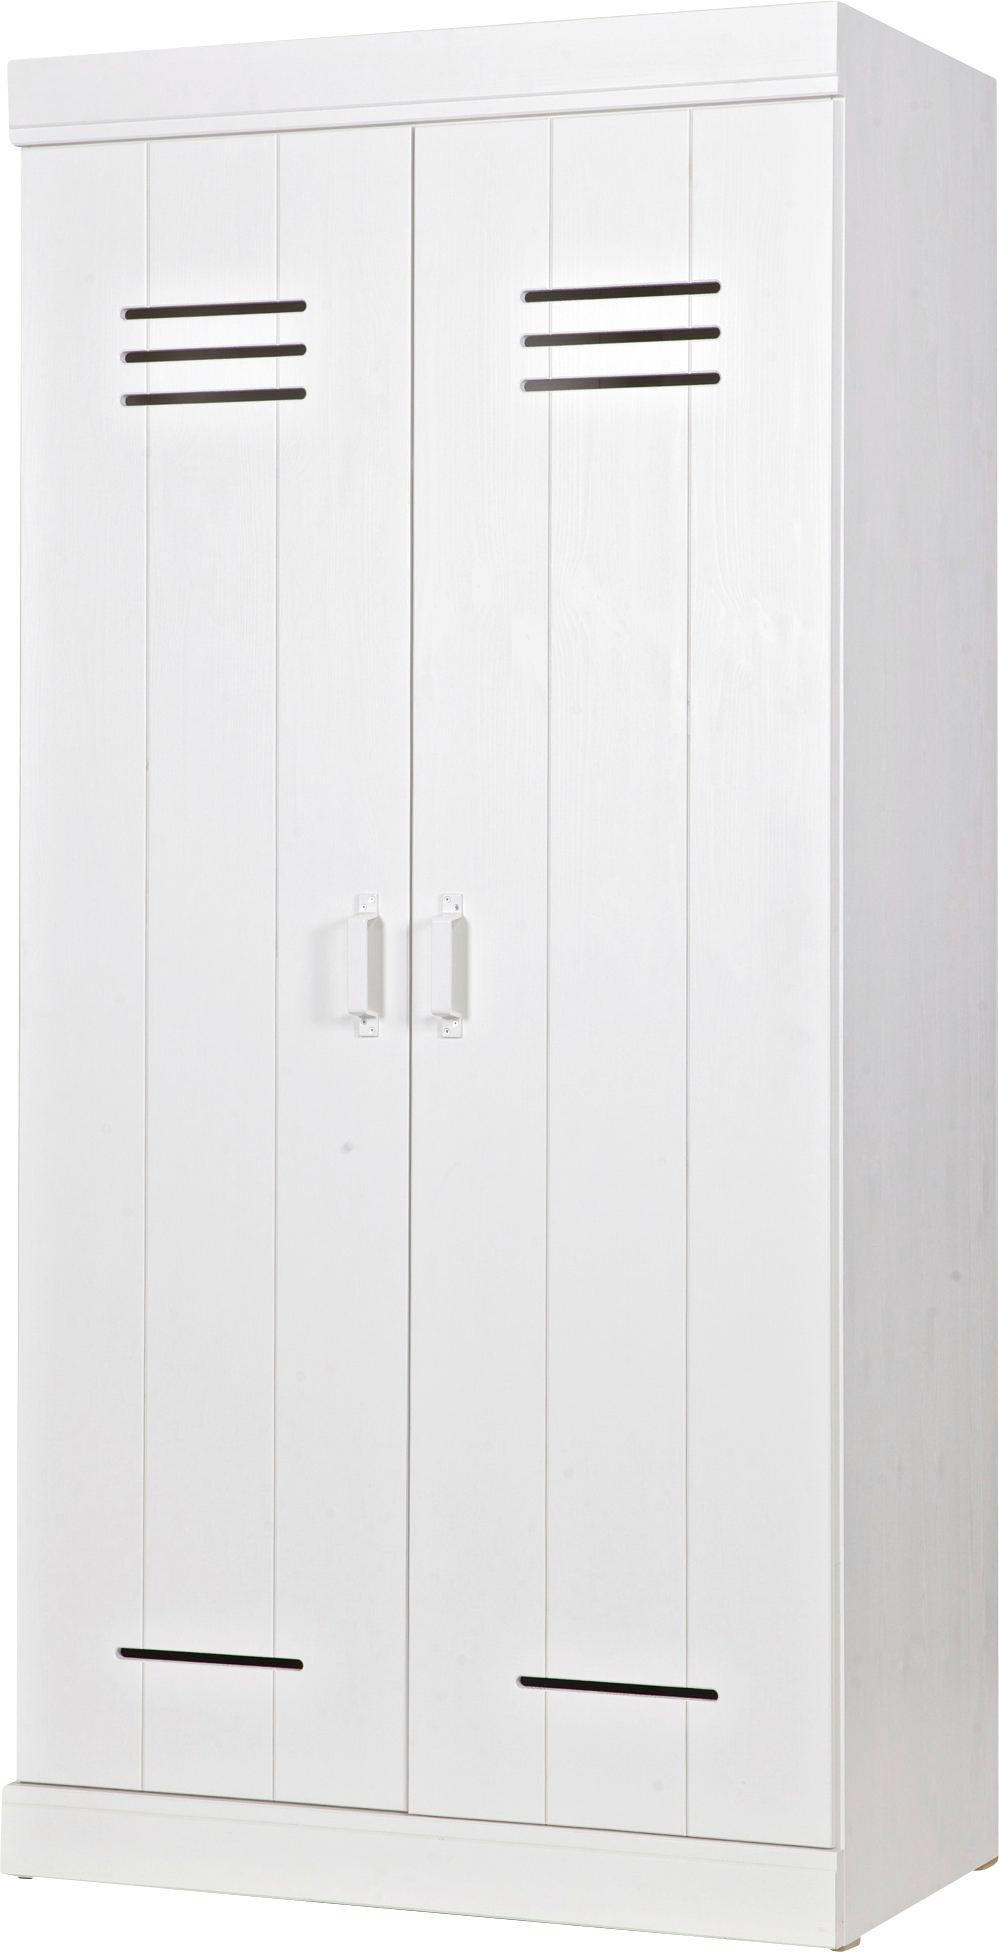 KLEIDERSCHRANK 2  Türig Kiefer Massiv, Teilmassiv Weiß   Weiß, ROMANTIK /  LANDHAUS,